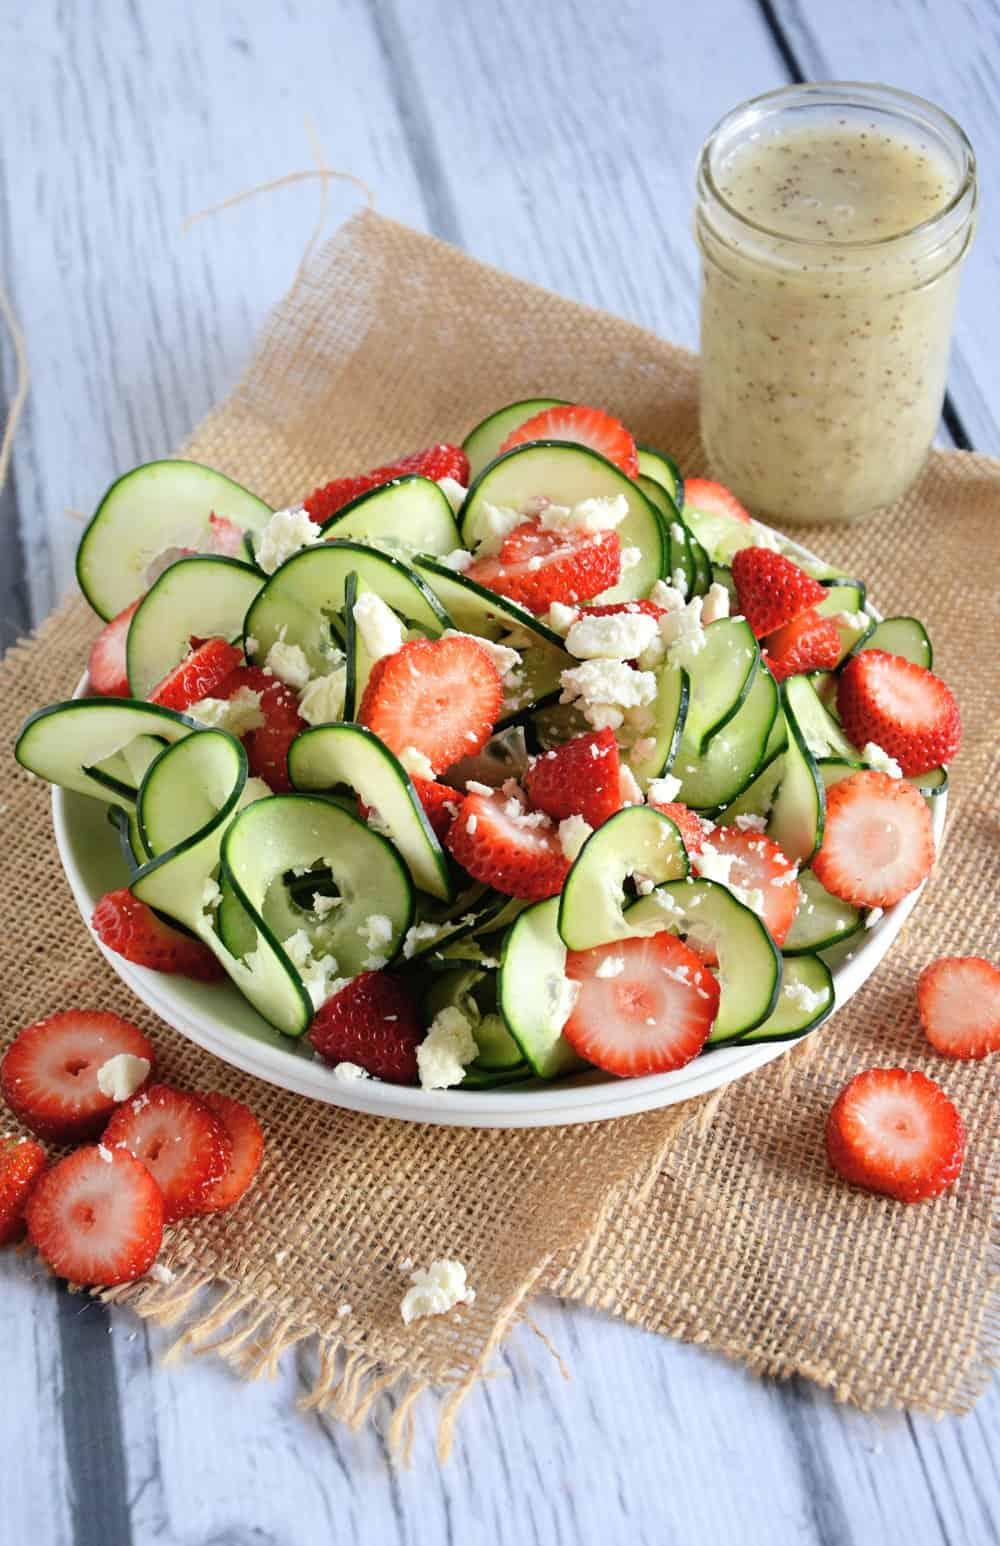 Cucumber and Strawberry Poppyseed Salad